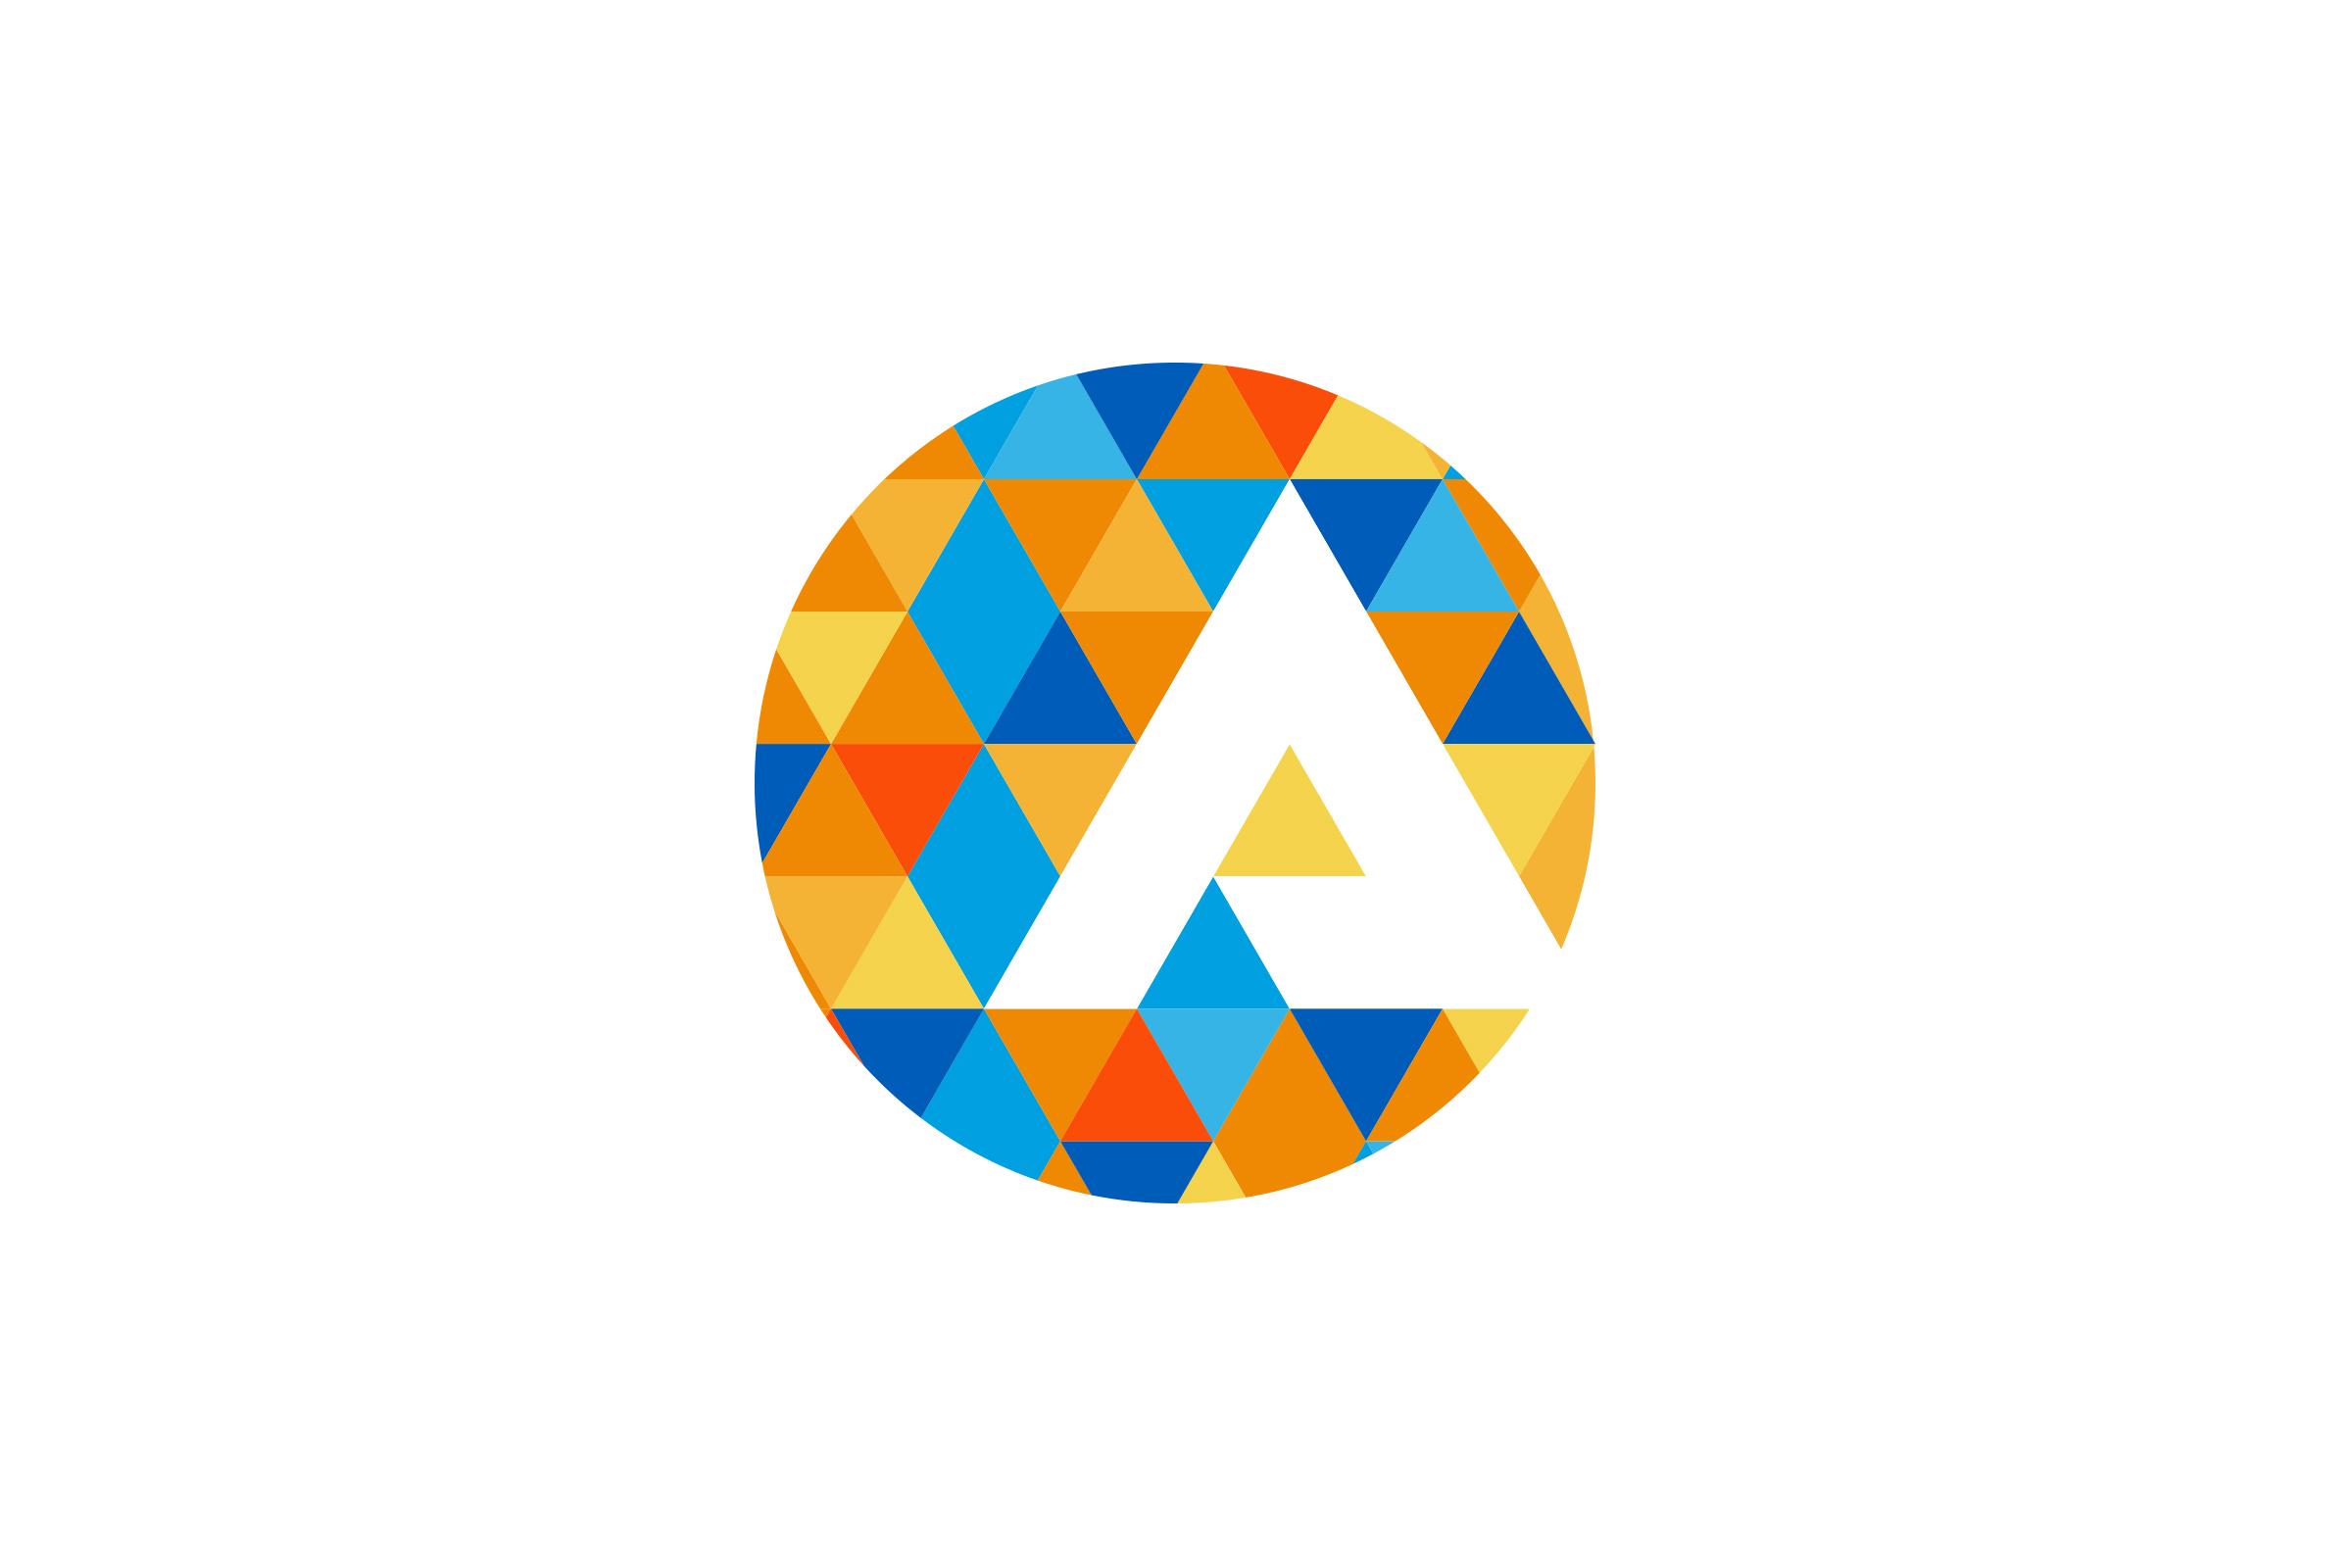 hearthfire-creative-logo-brand-identity-designer-denver-colorado-all-is-me-2.jpg